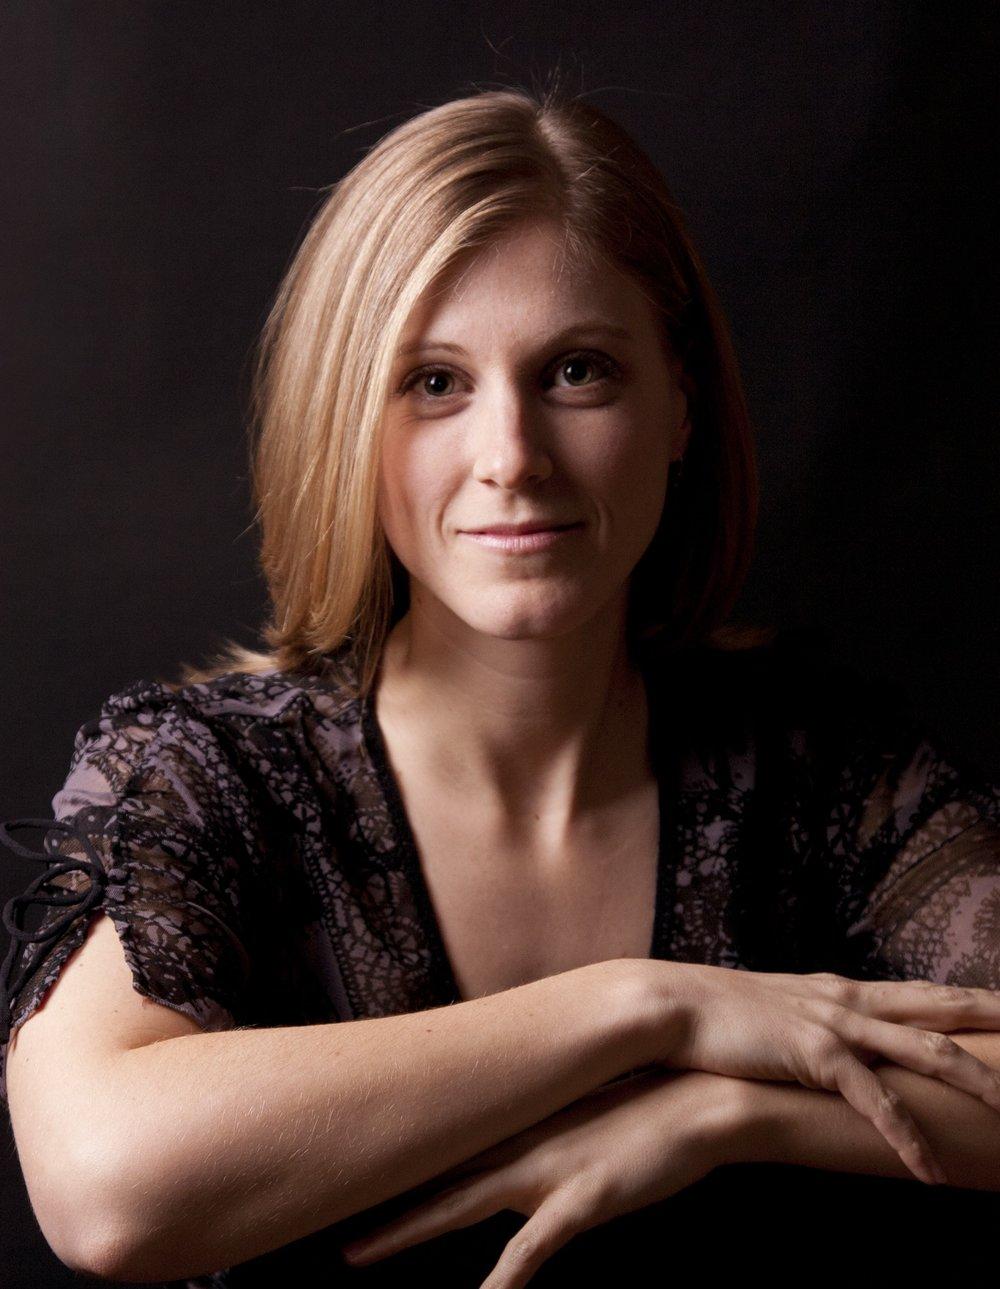 Heather-22-Cropped1.jpg